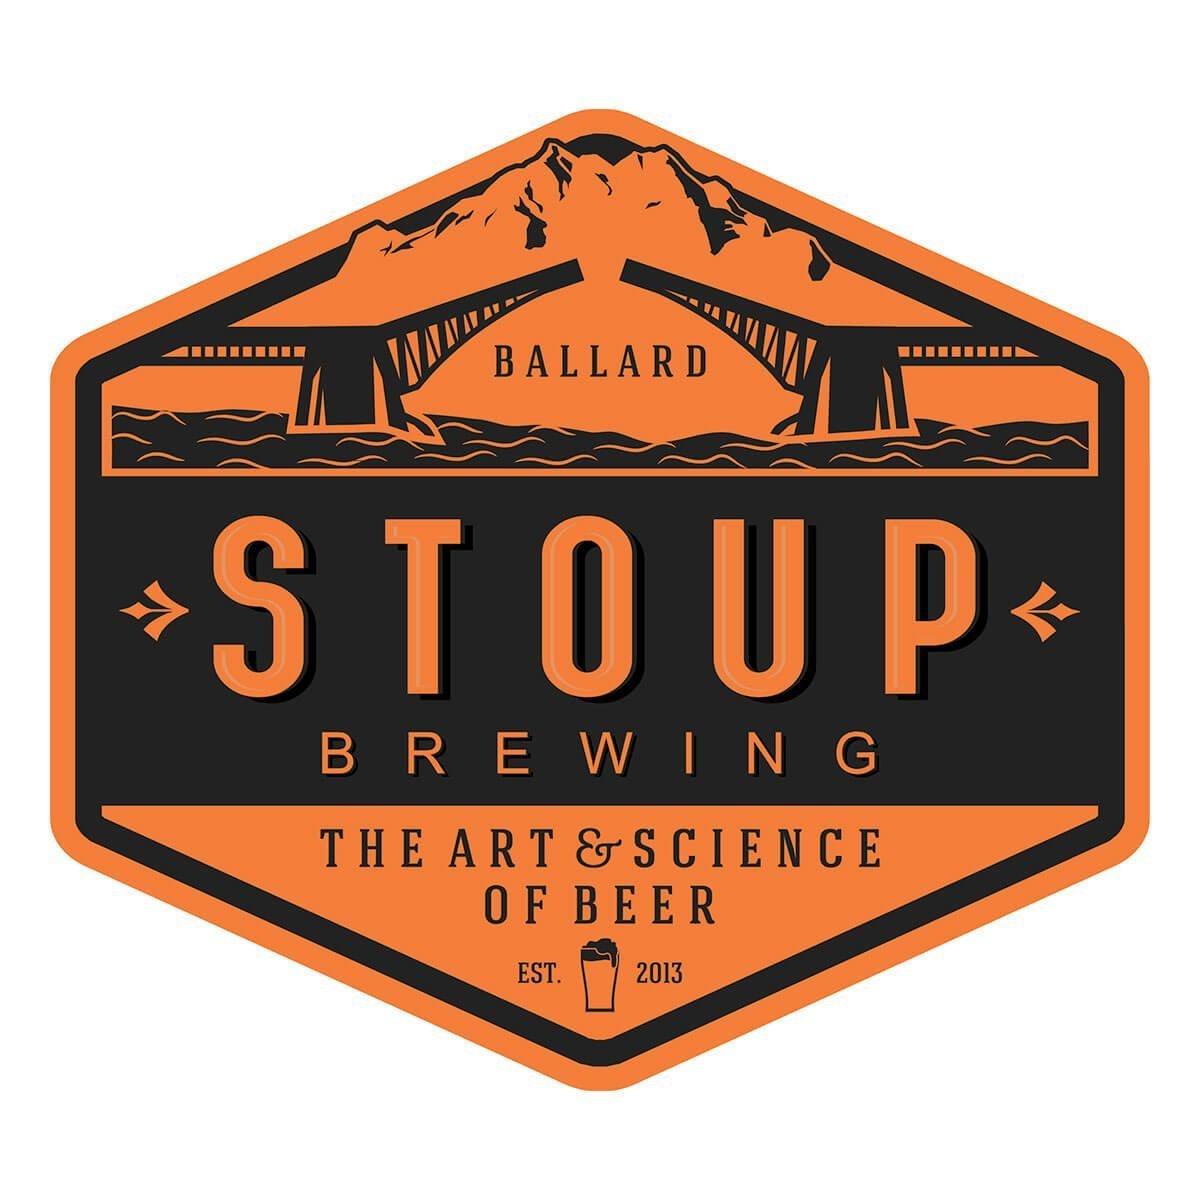 Stoup Brewing Logo